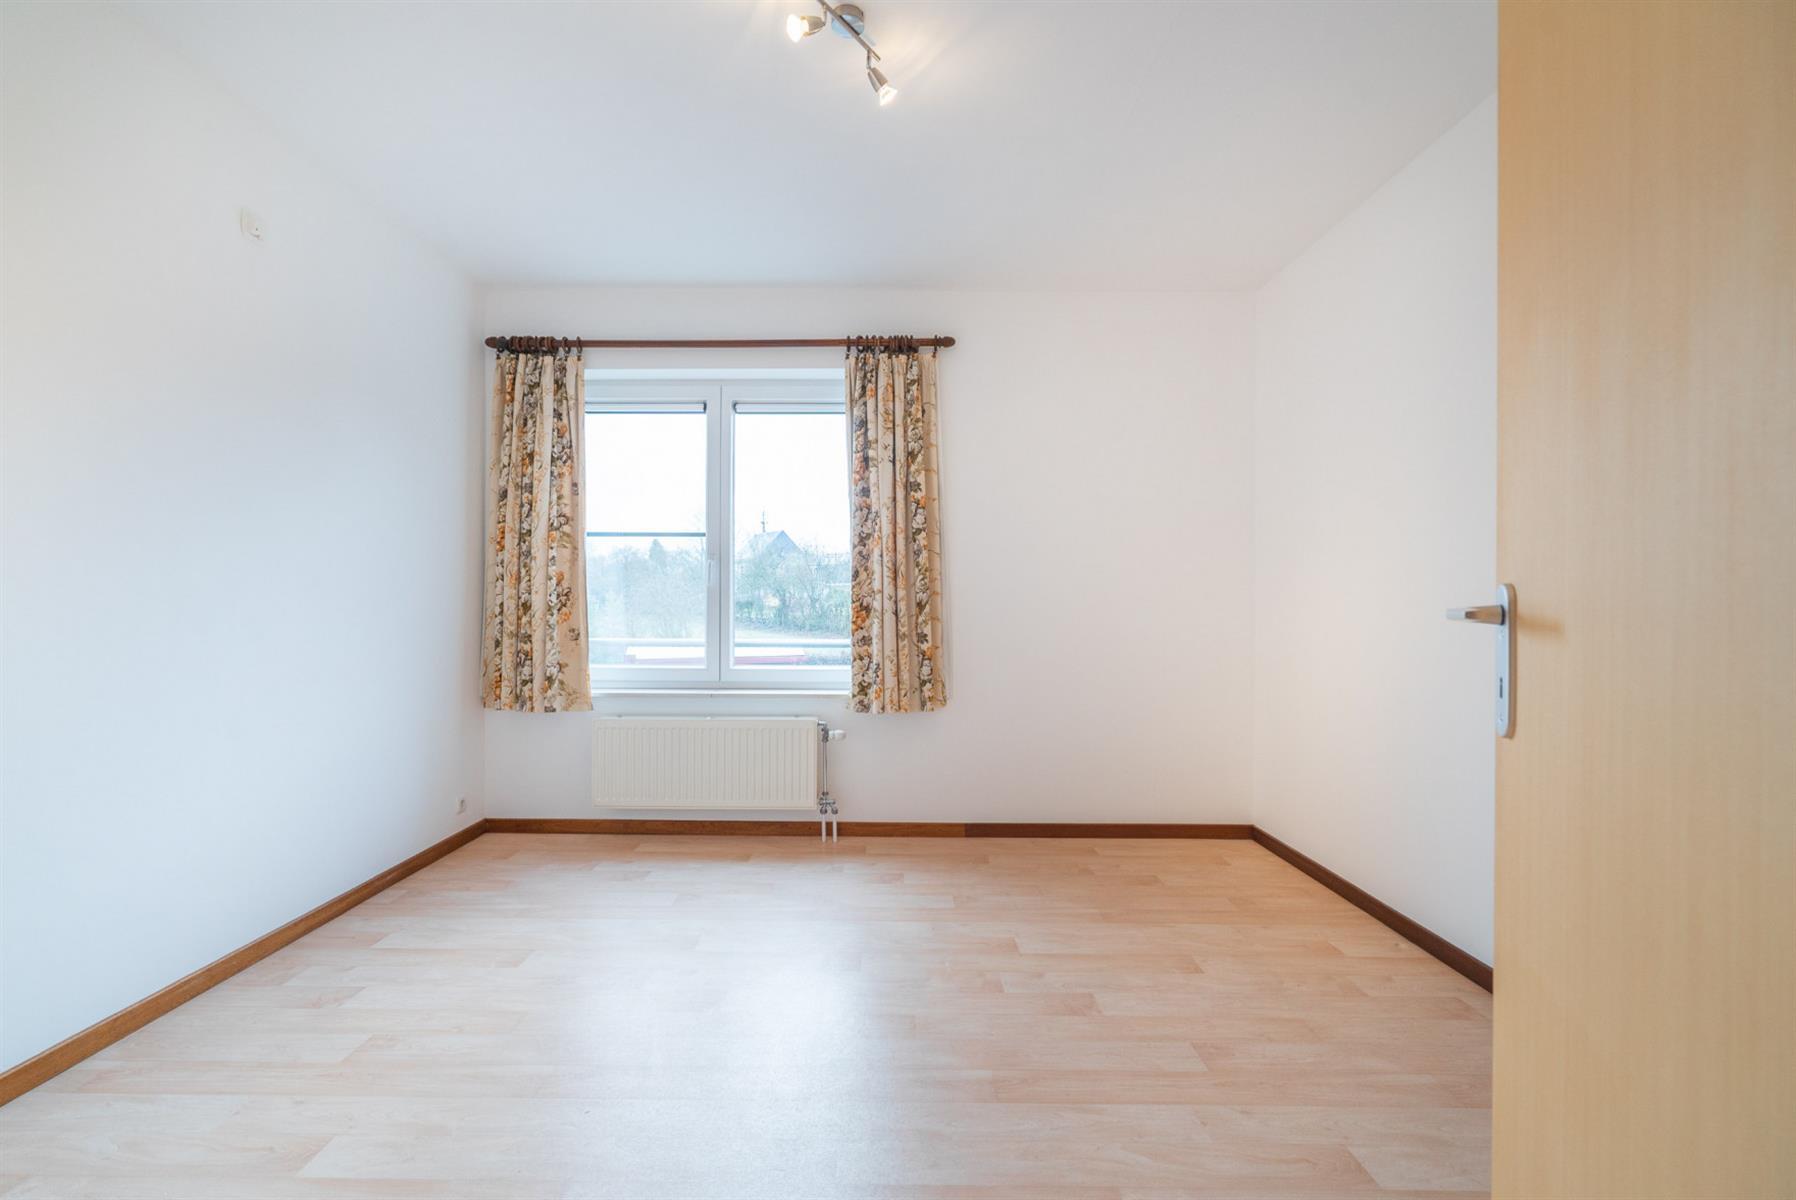 Appartement - Jalhay - #4305578-8